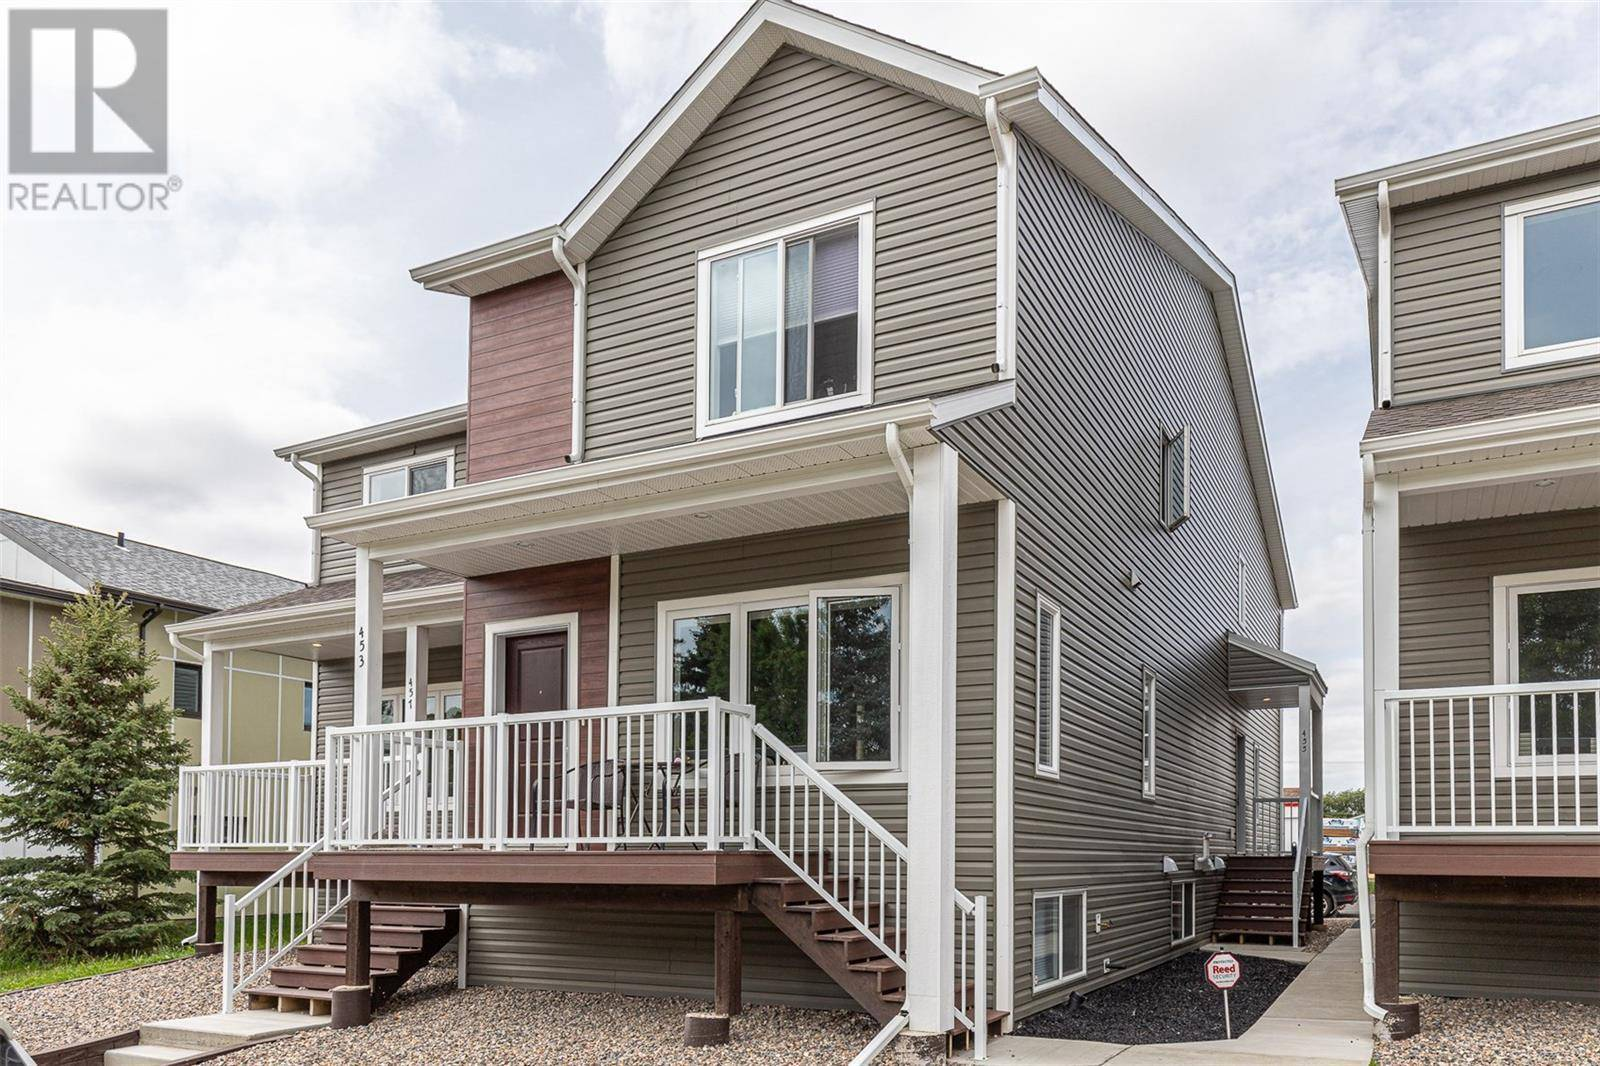 Townhouse for sale at 455 L Ave S Saskatoon Saskatchewan - MLS: SK784214